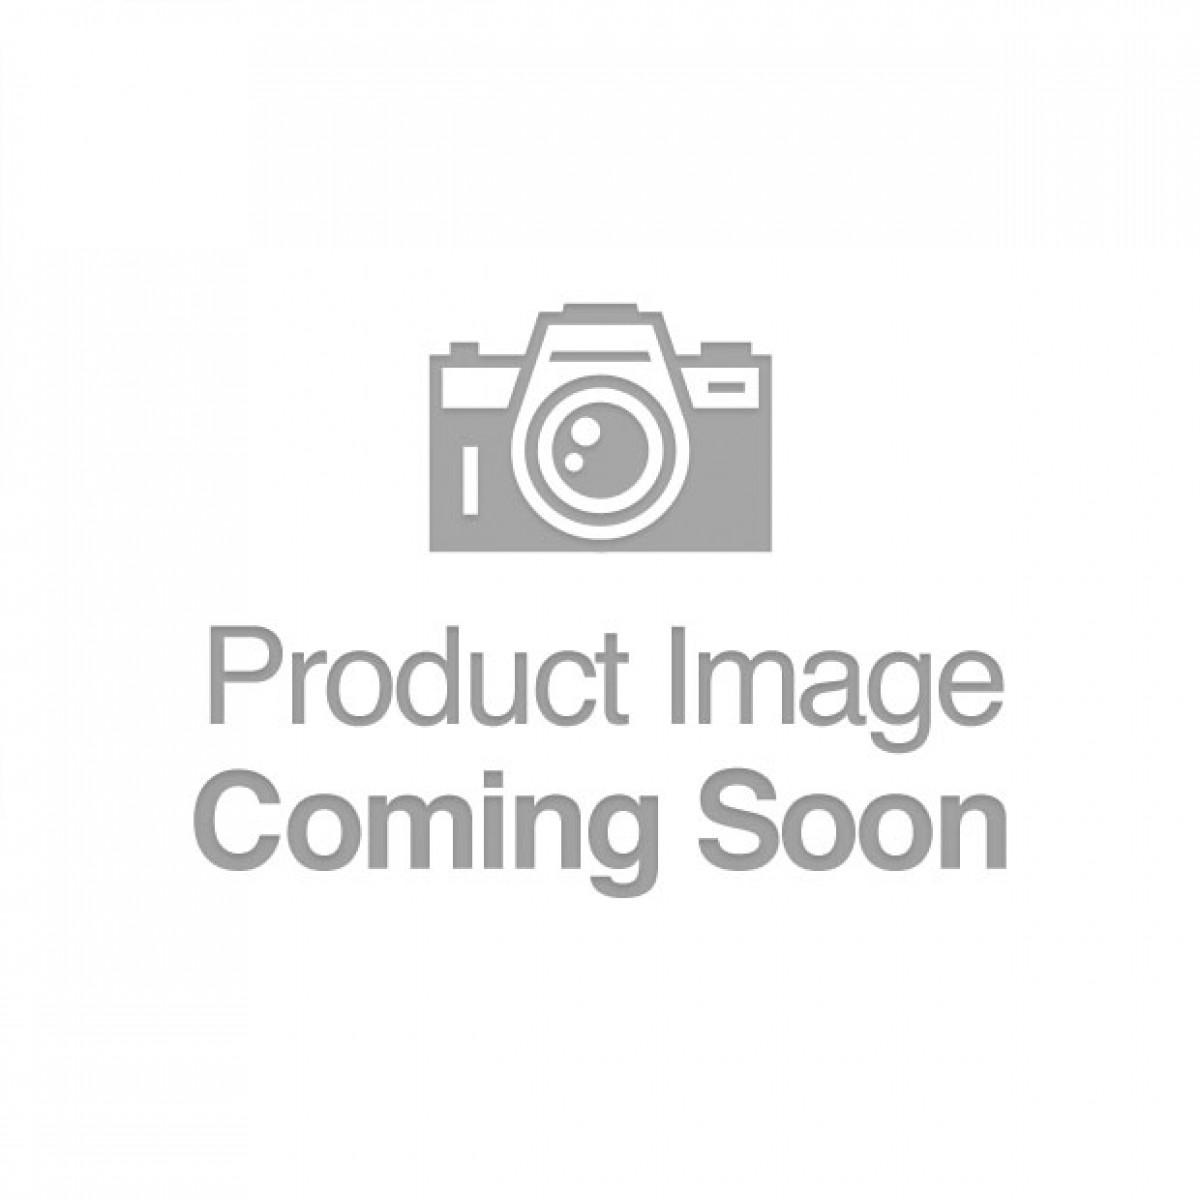 Cocksicle Fizzin 10x Silicone Rechargeable Vibrator - Purple